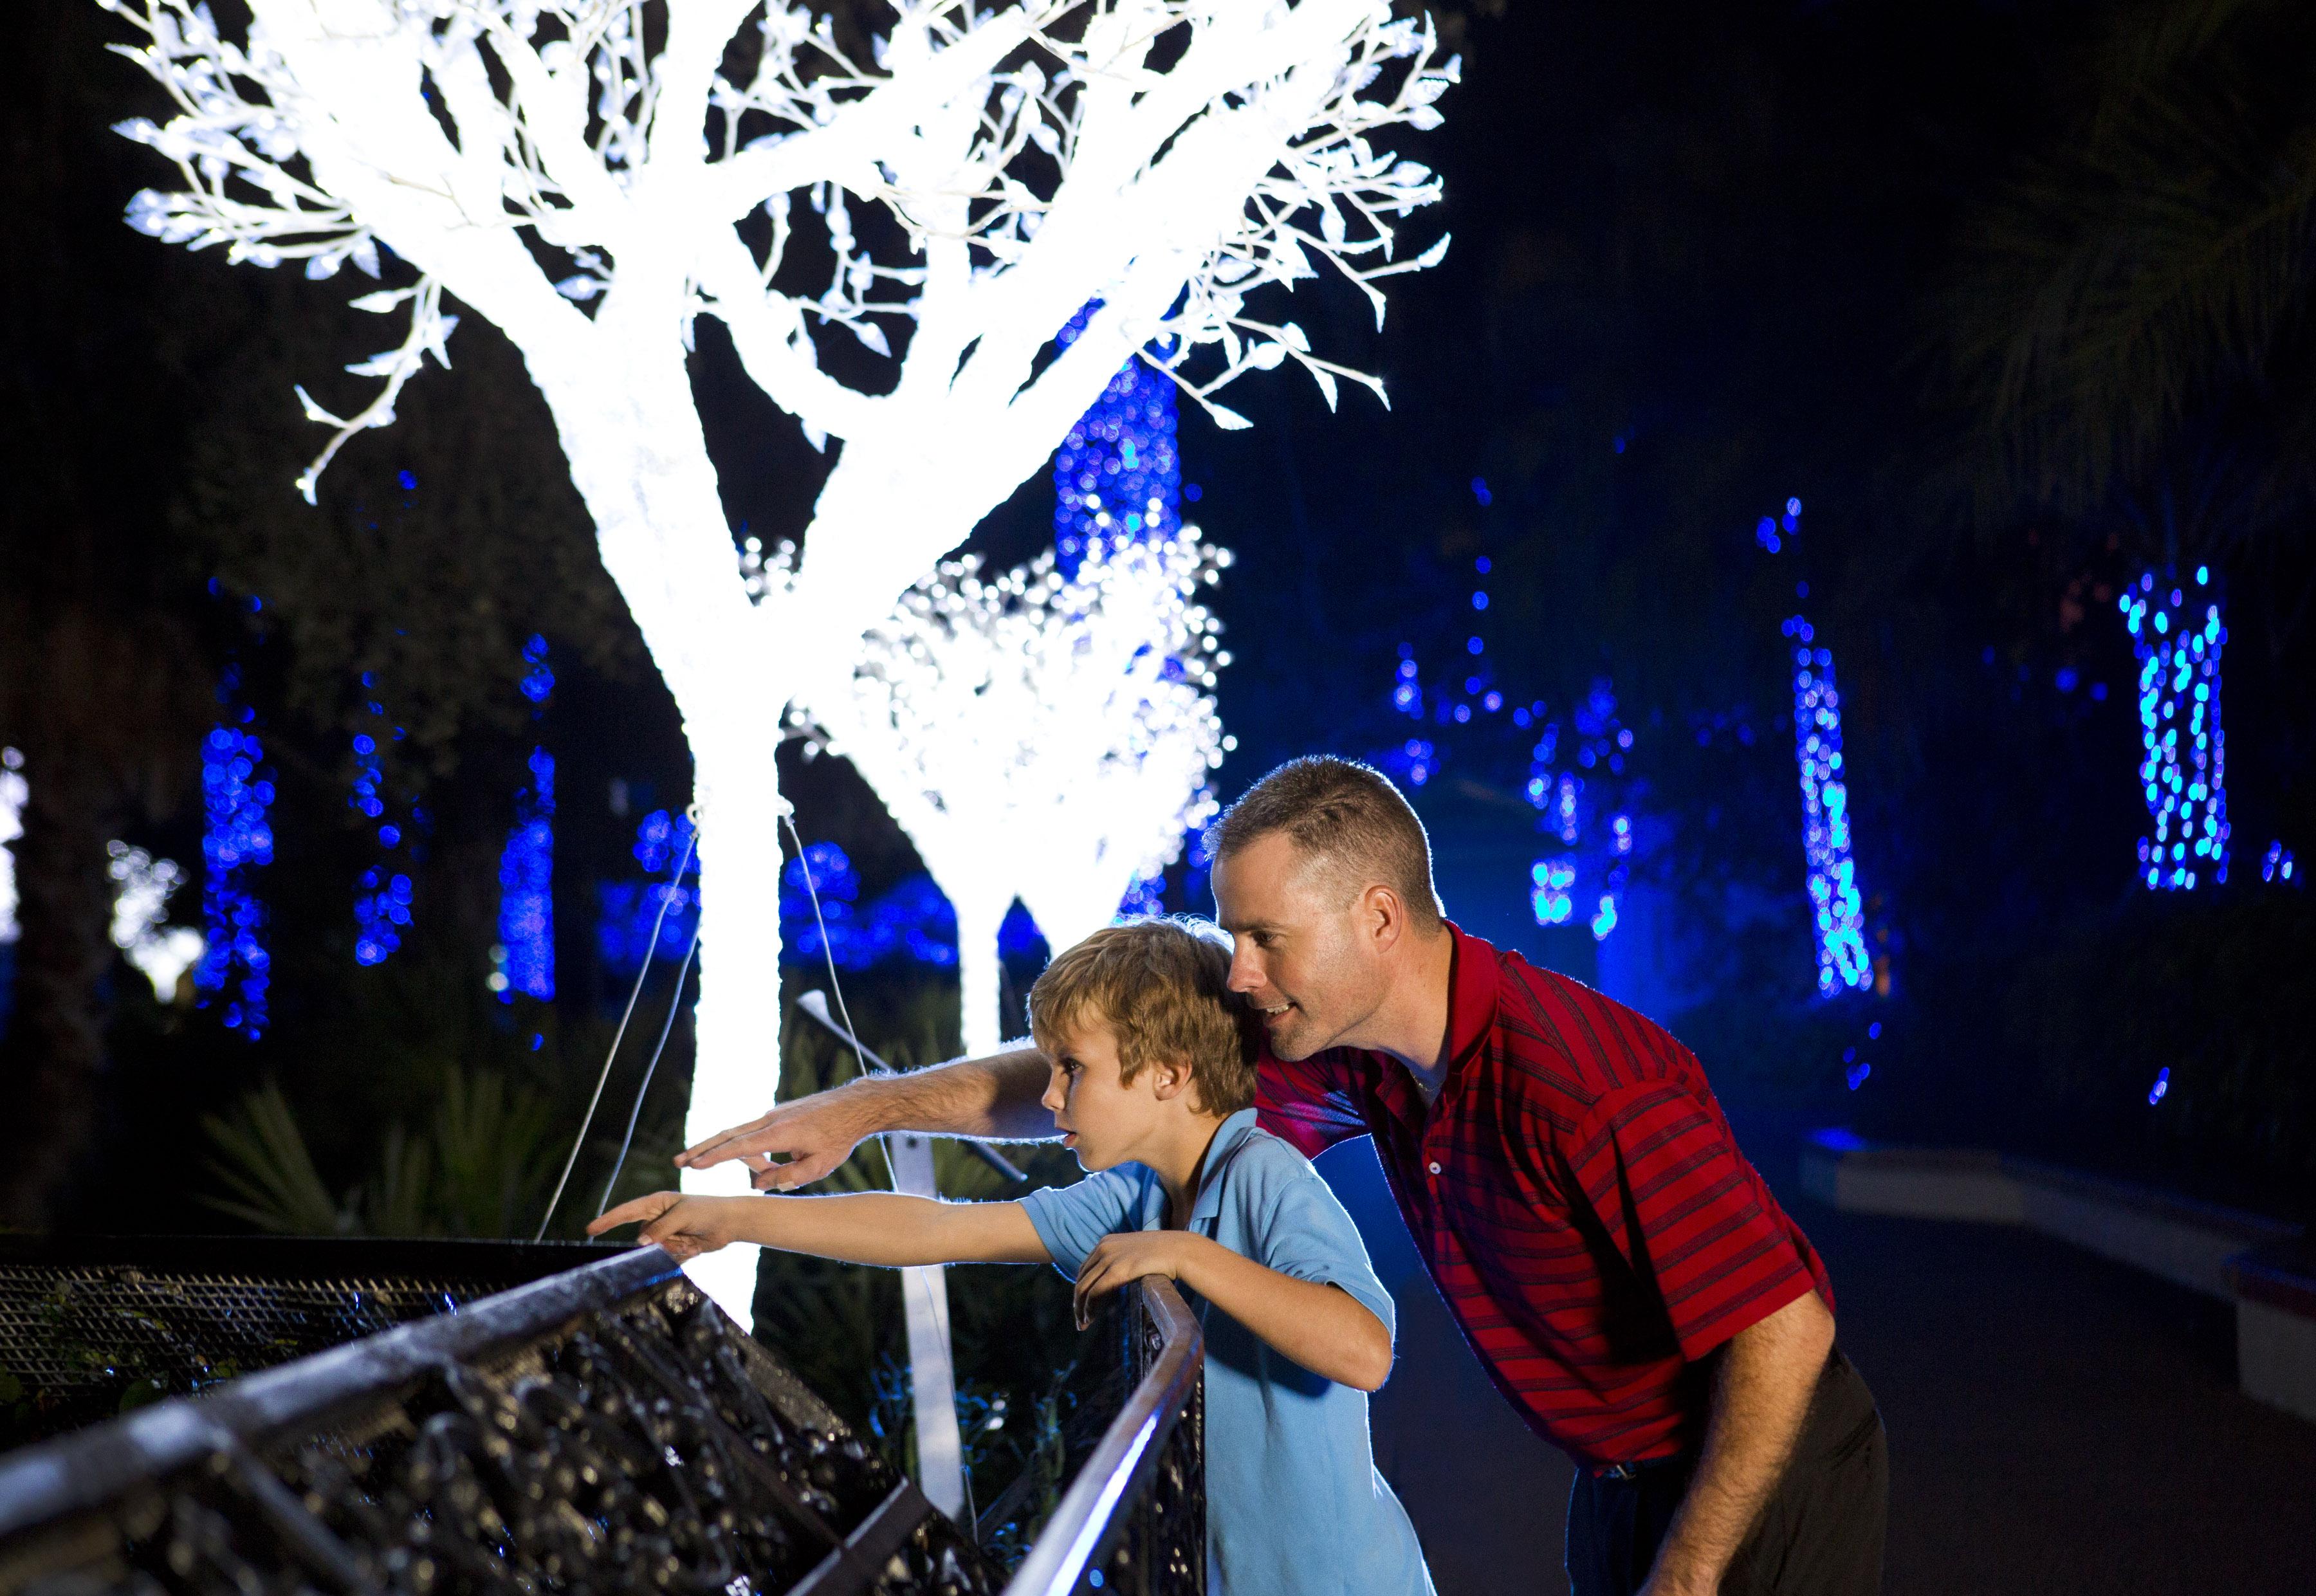 Theme Park Review Busch Gardens Tampa Bay Bgt Bga Discussion Thread Page 398